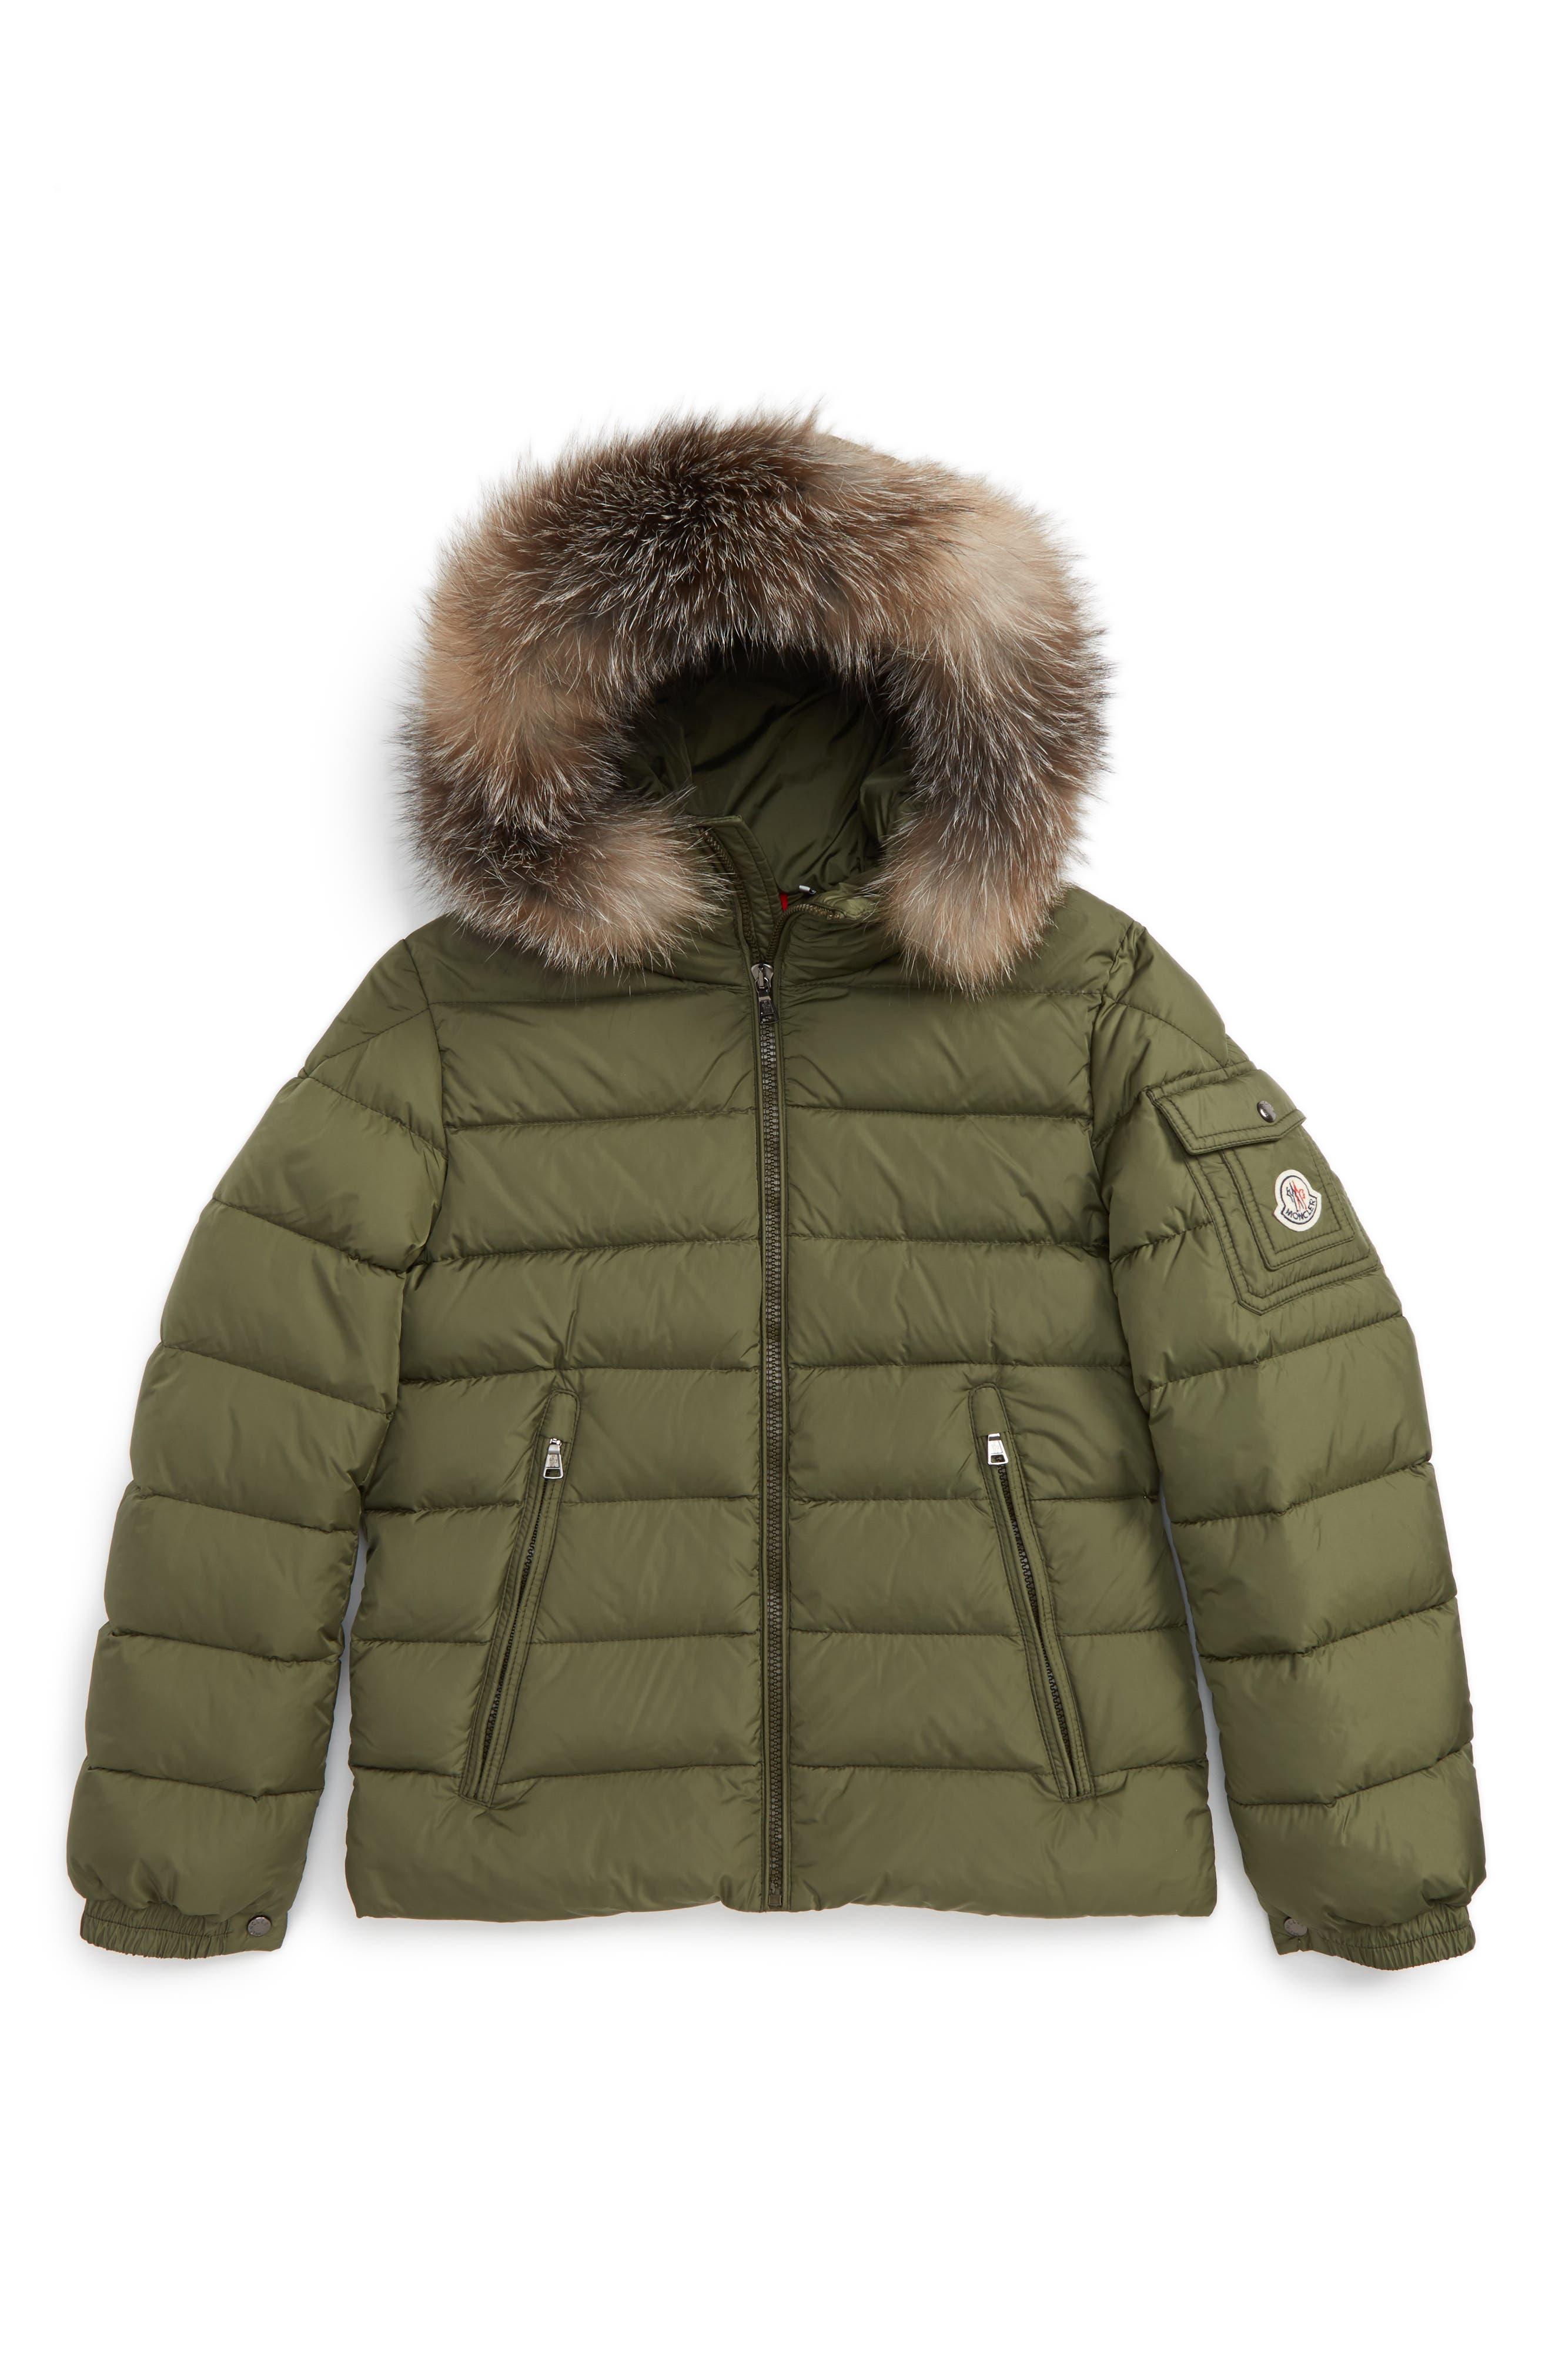 Moncler Byron Water Resistant Down Jacket with Genuine Fox Fur Trim (Little Boys & Big Boys)